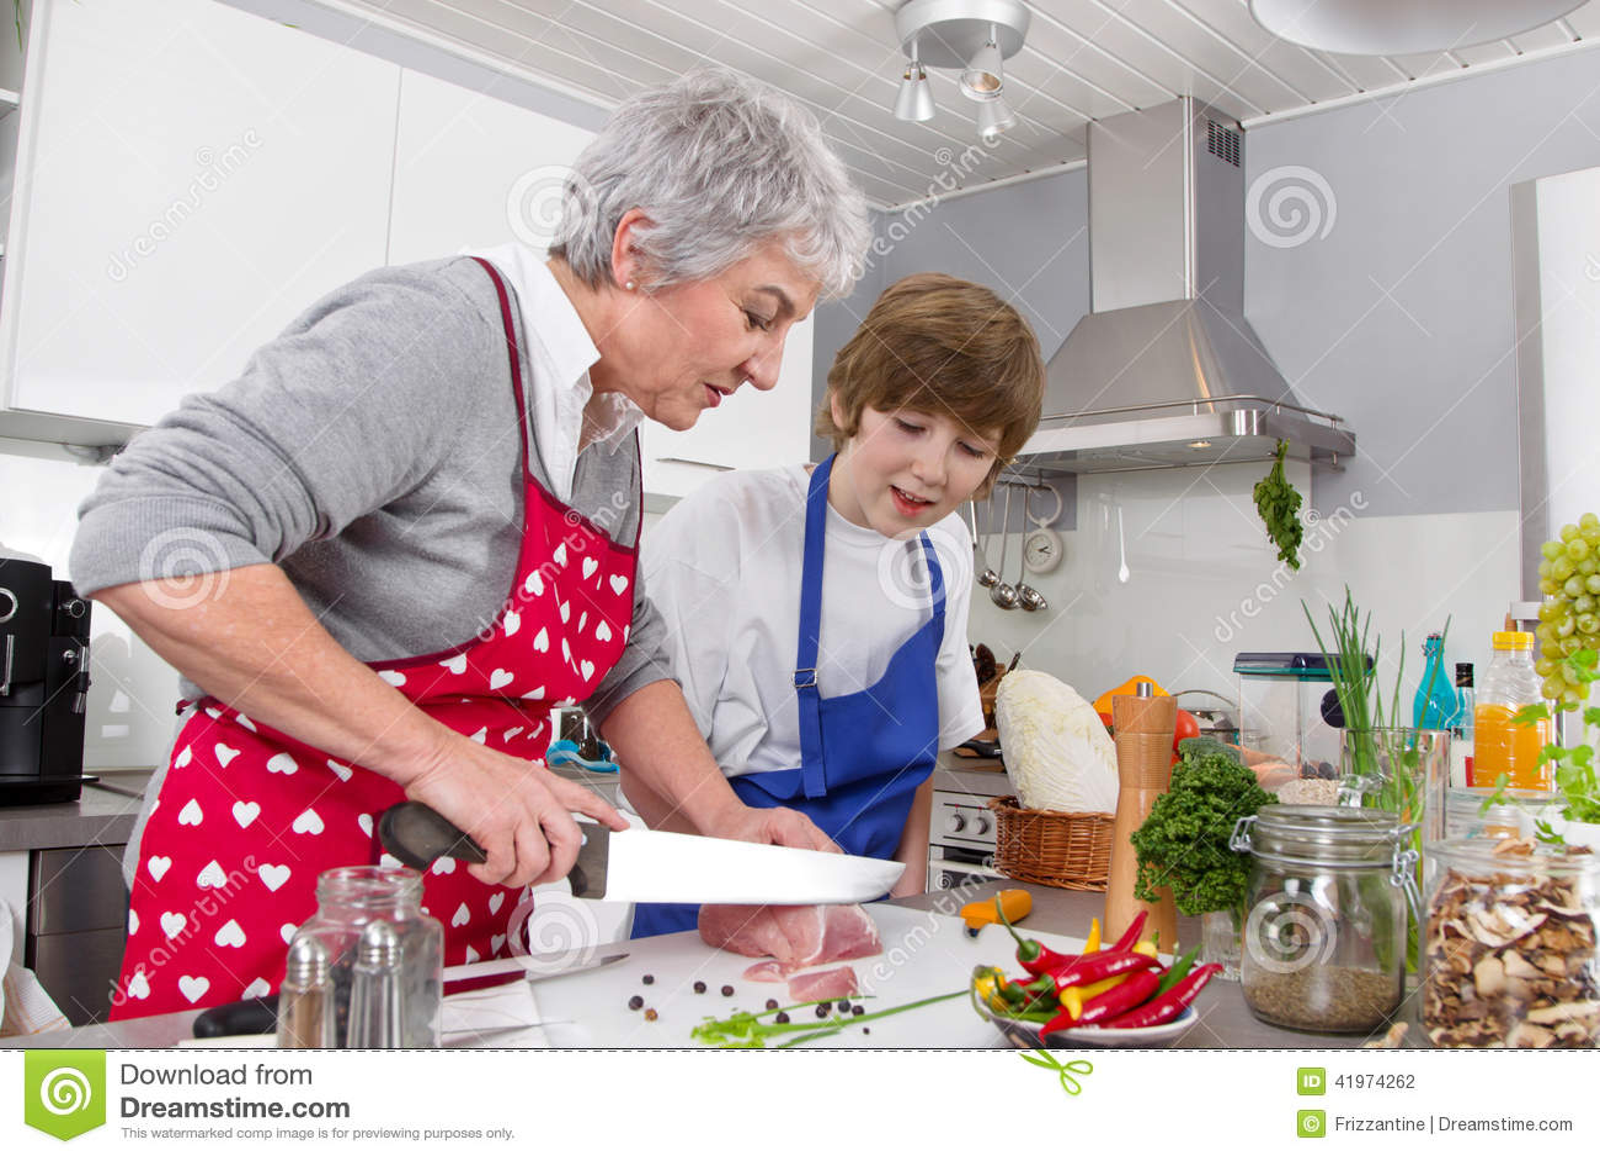 Kitchen Table Family Preparing Fresh Food